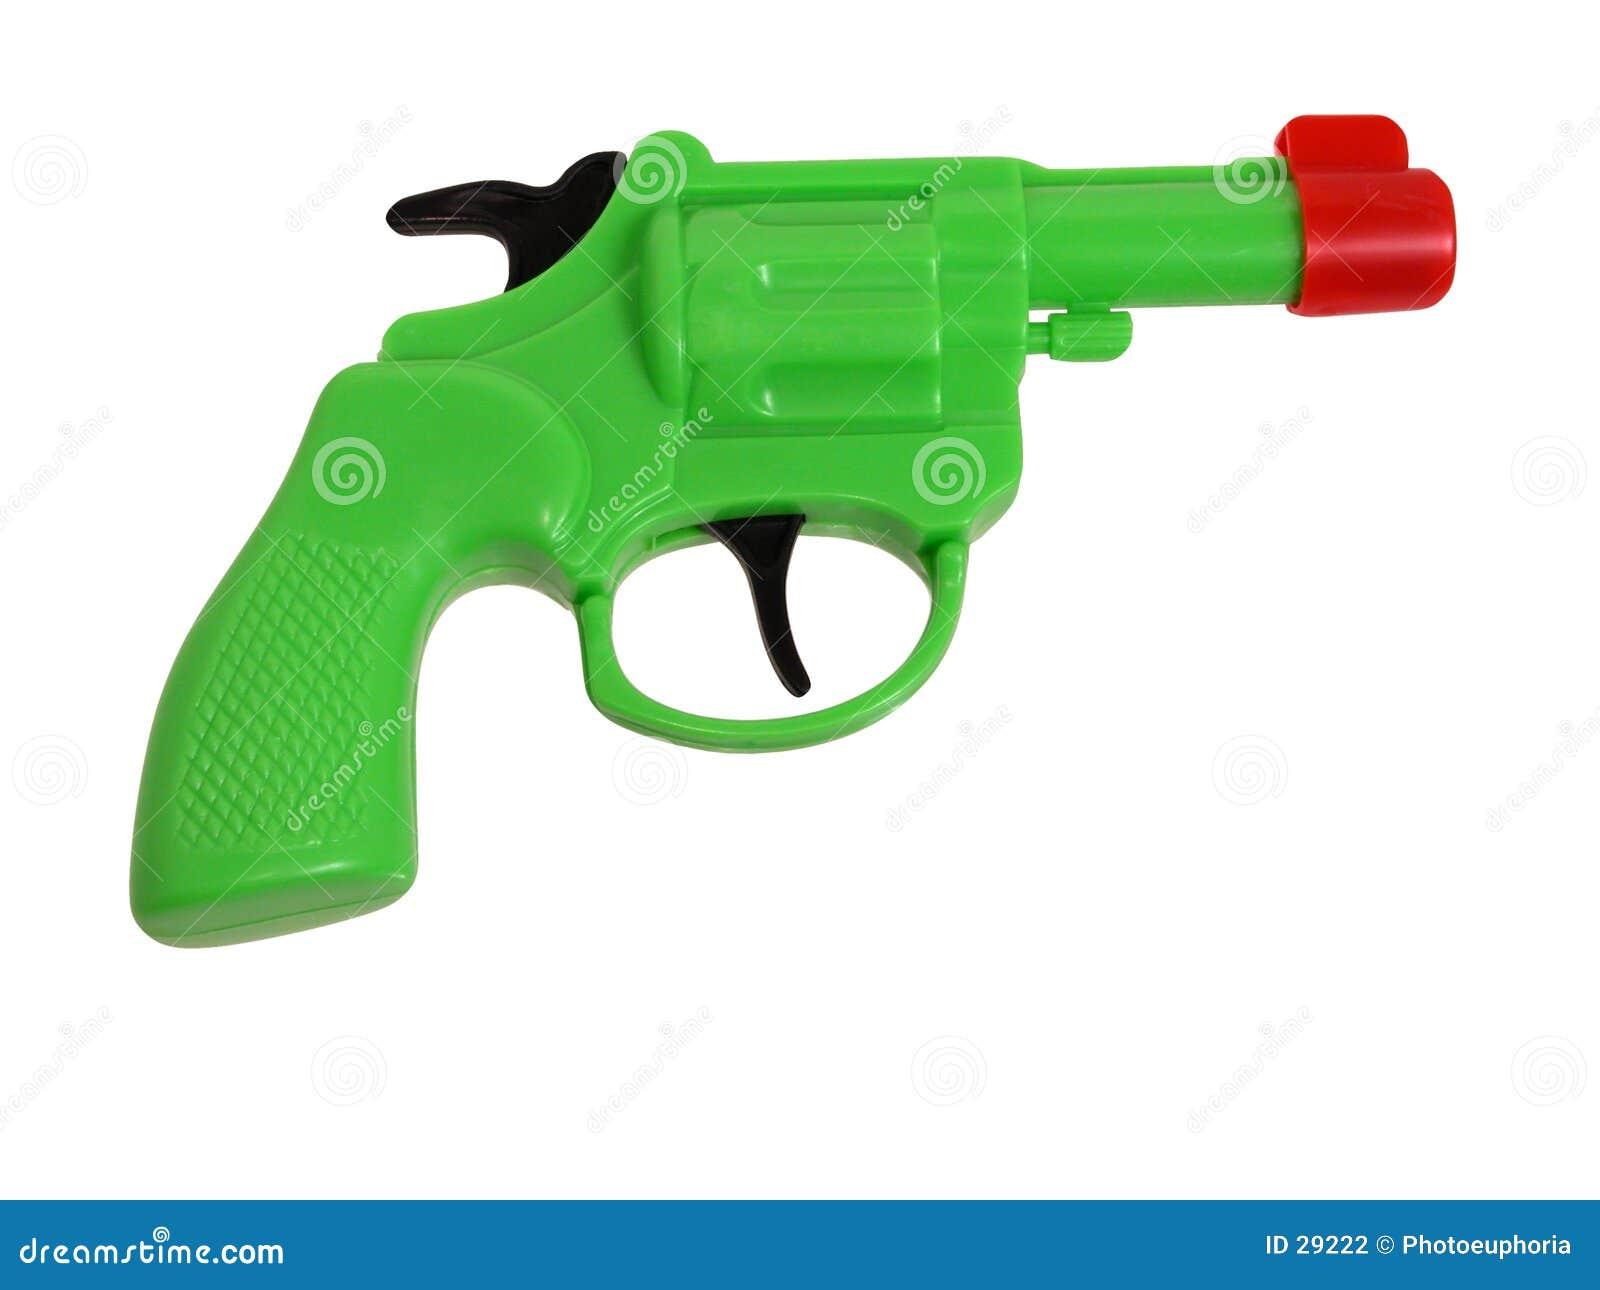 Speelgoed: Groen Plastic Kanon